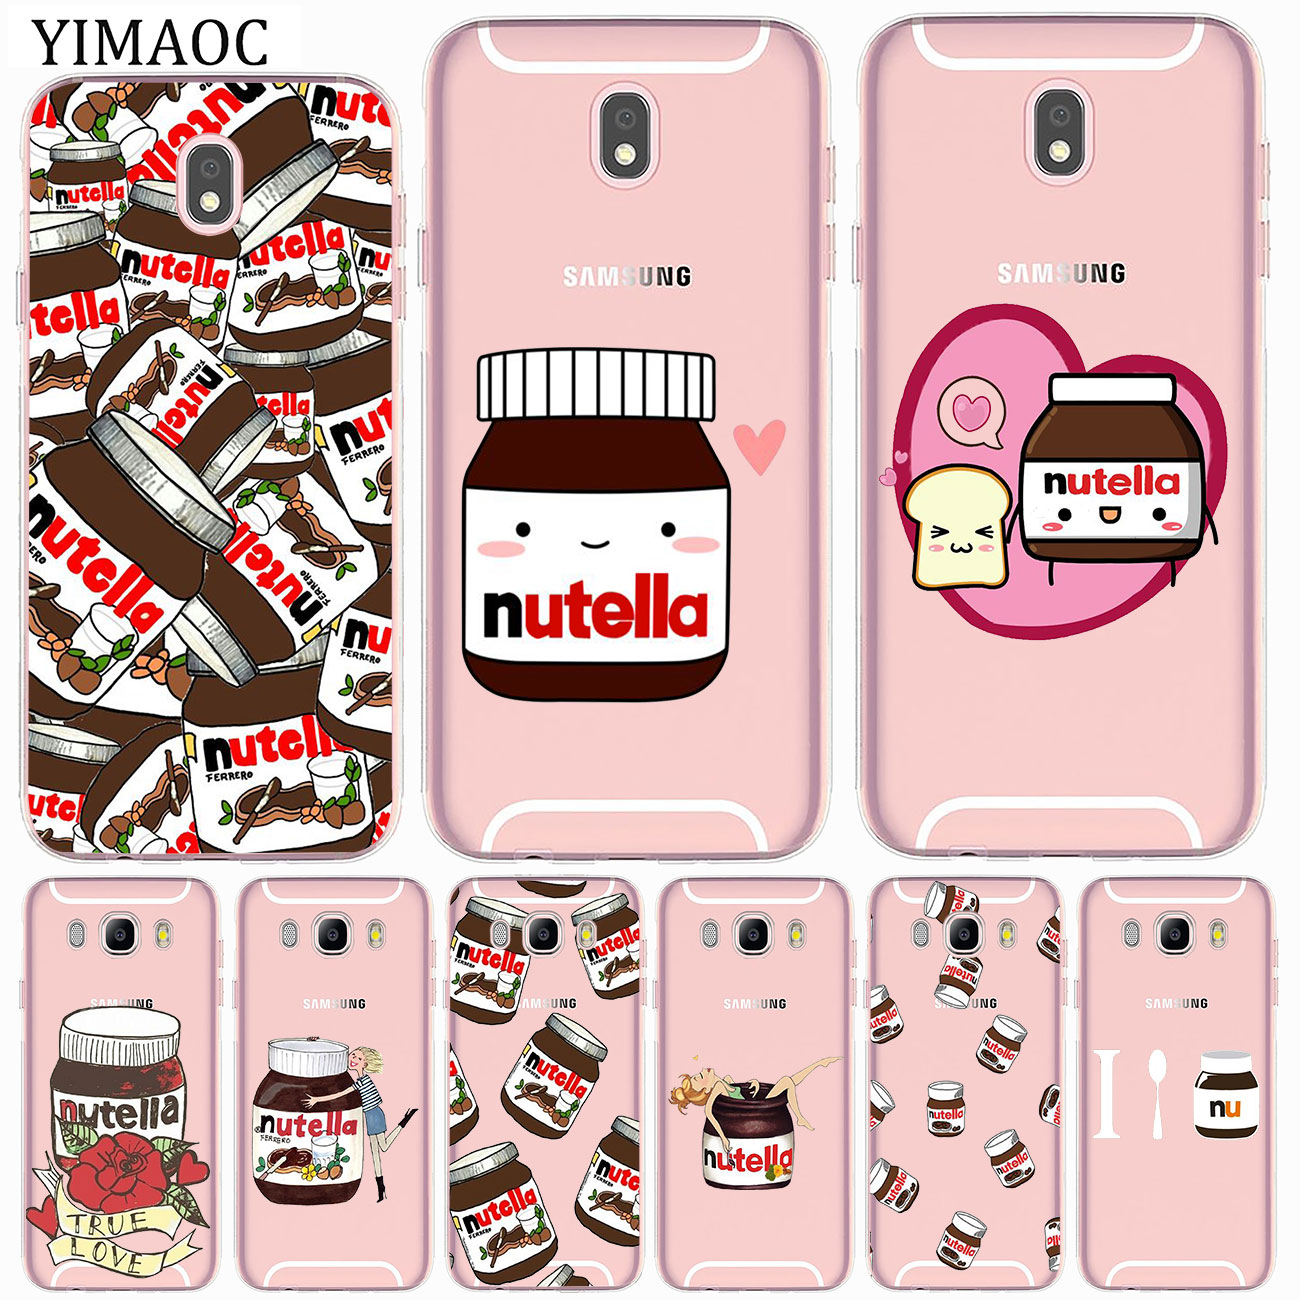 Coque en Silicone souple Tumblr Nutella, pour Samsung Galaxy J8 J7 J6 J5 J4 J3 2017 A2 Core 2016 A5 A9 A8 A7 A6 Plus 2018